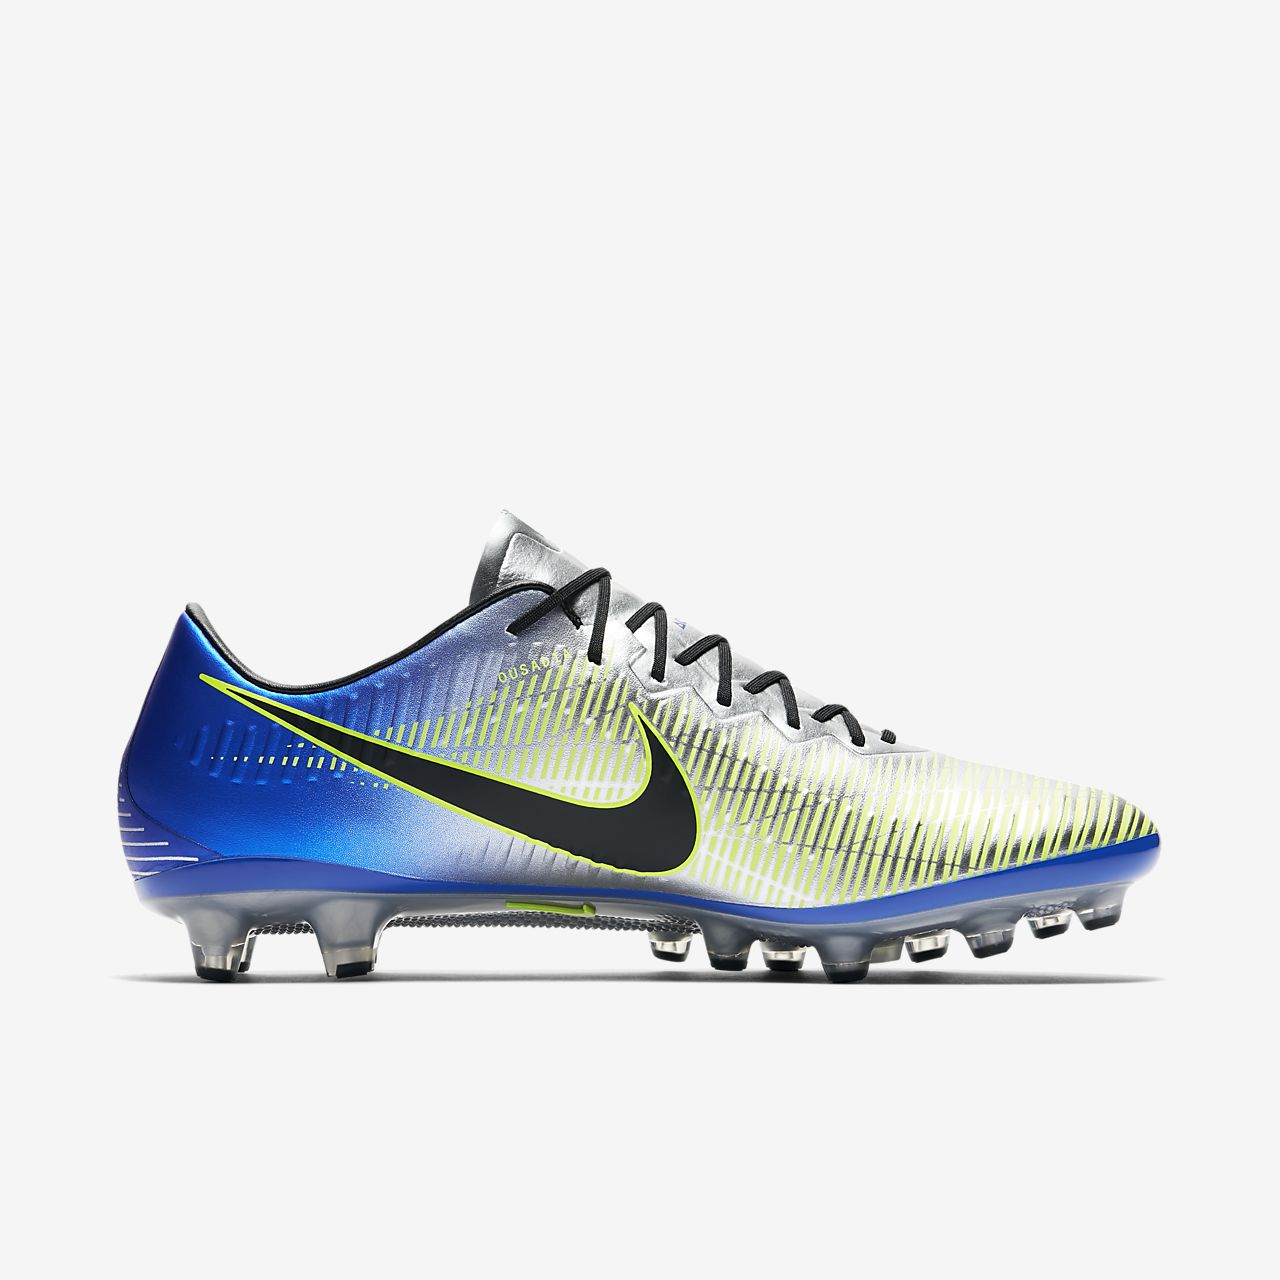 ... Nike Mercurial Vapor XI Neymar AG-PRO Fußballschuh für Kunstrasen